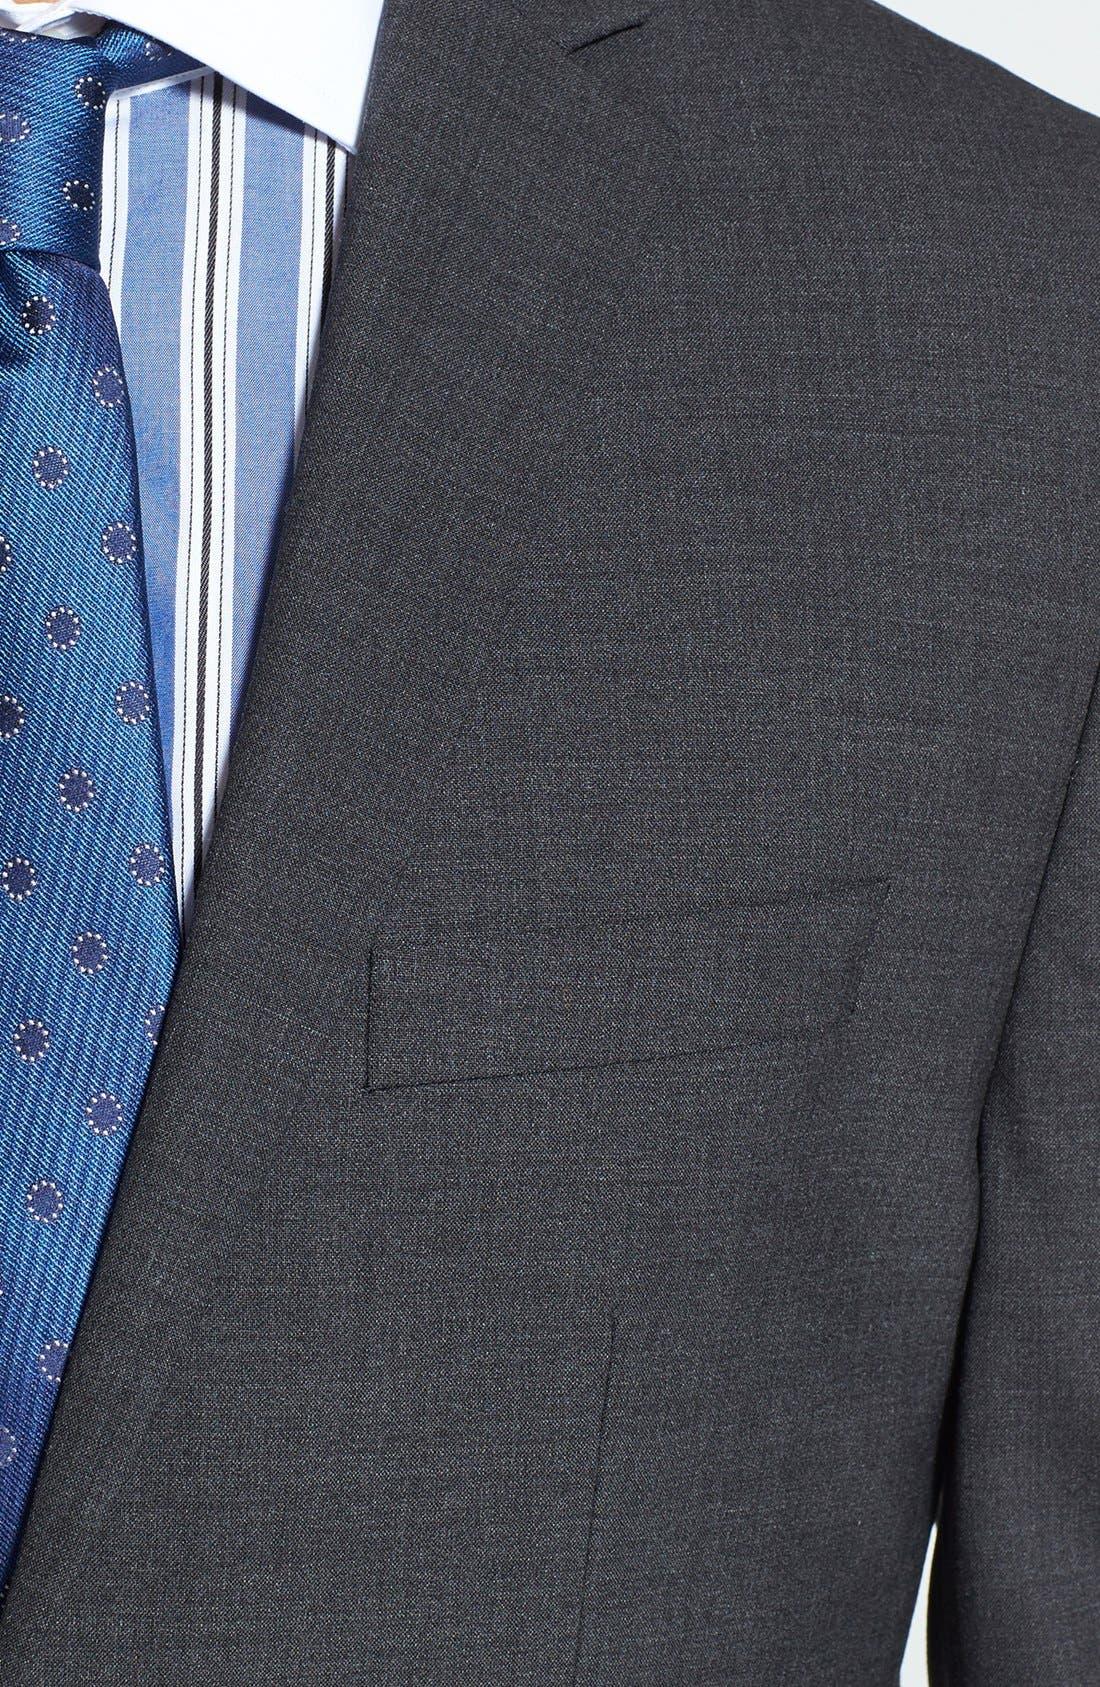 Alternate Image 3  - Kenneth Cole Collection Wool Blend Blazer